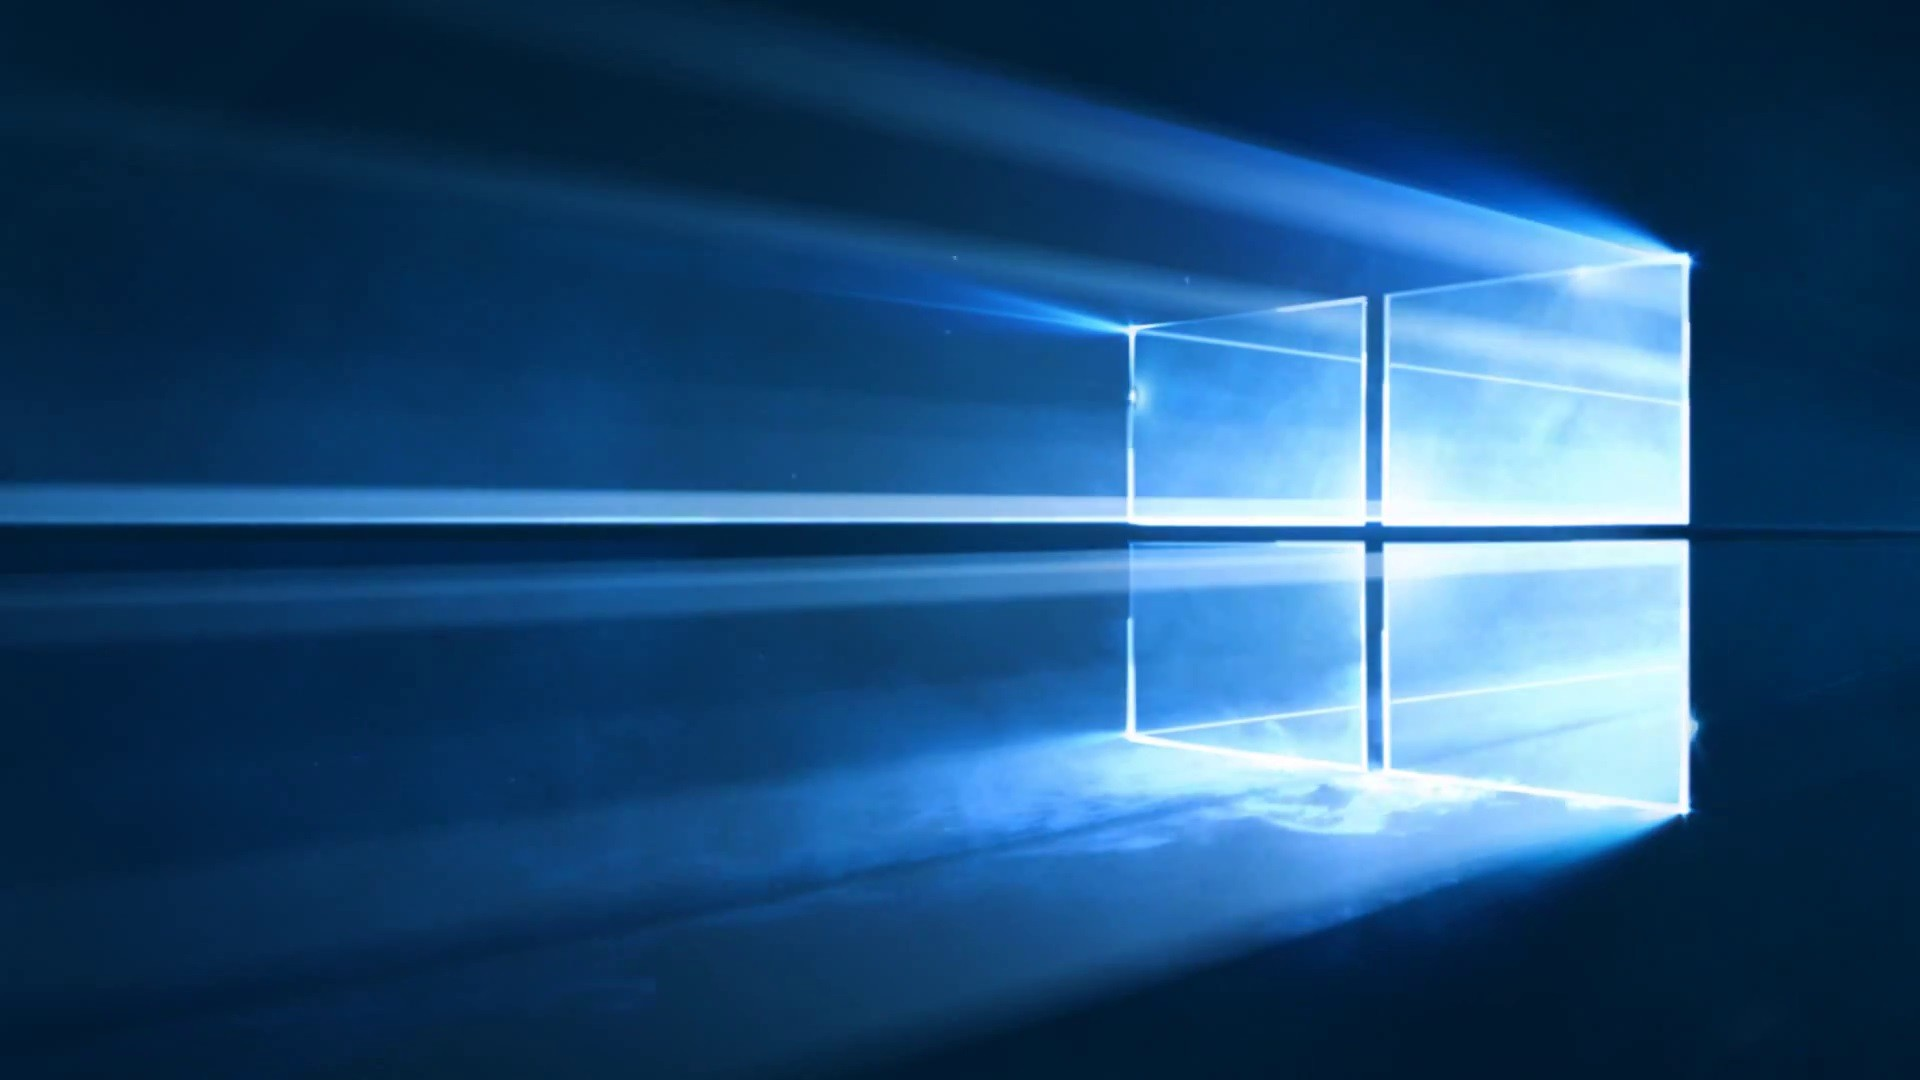 50 Default Windows 10 Wallpapers On Wallpapersafari